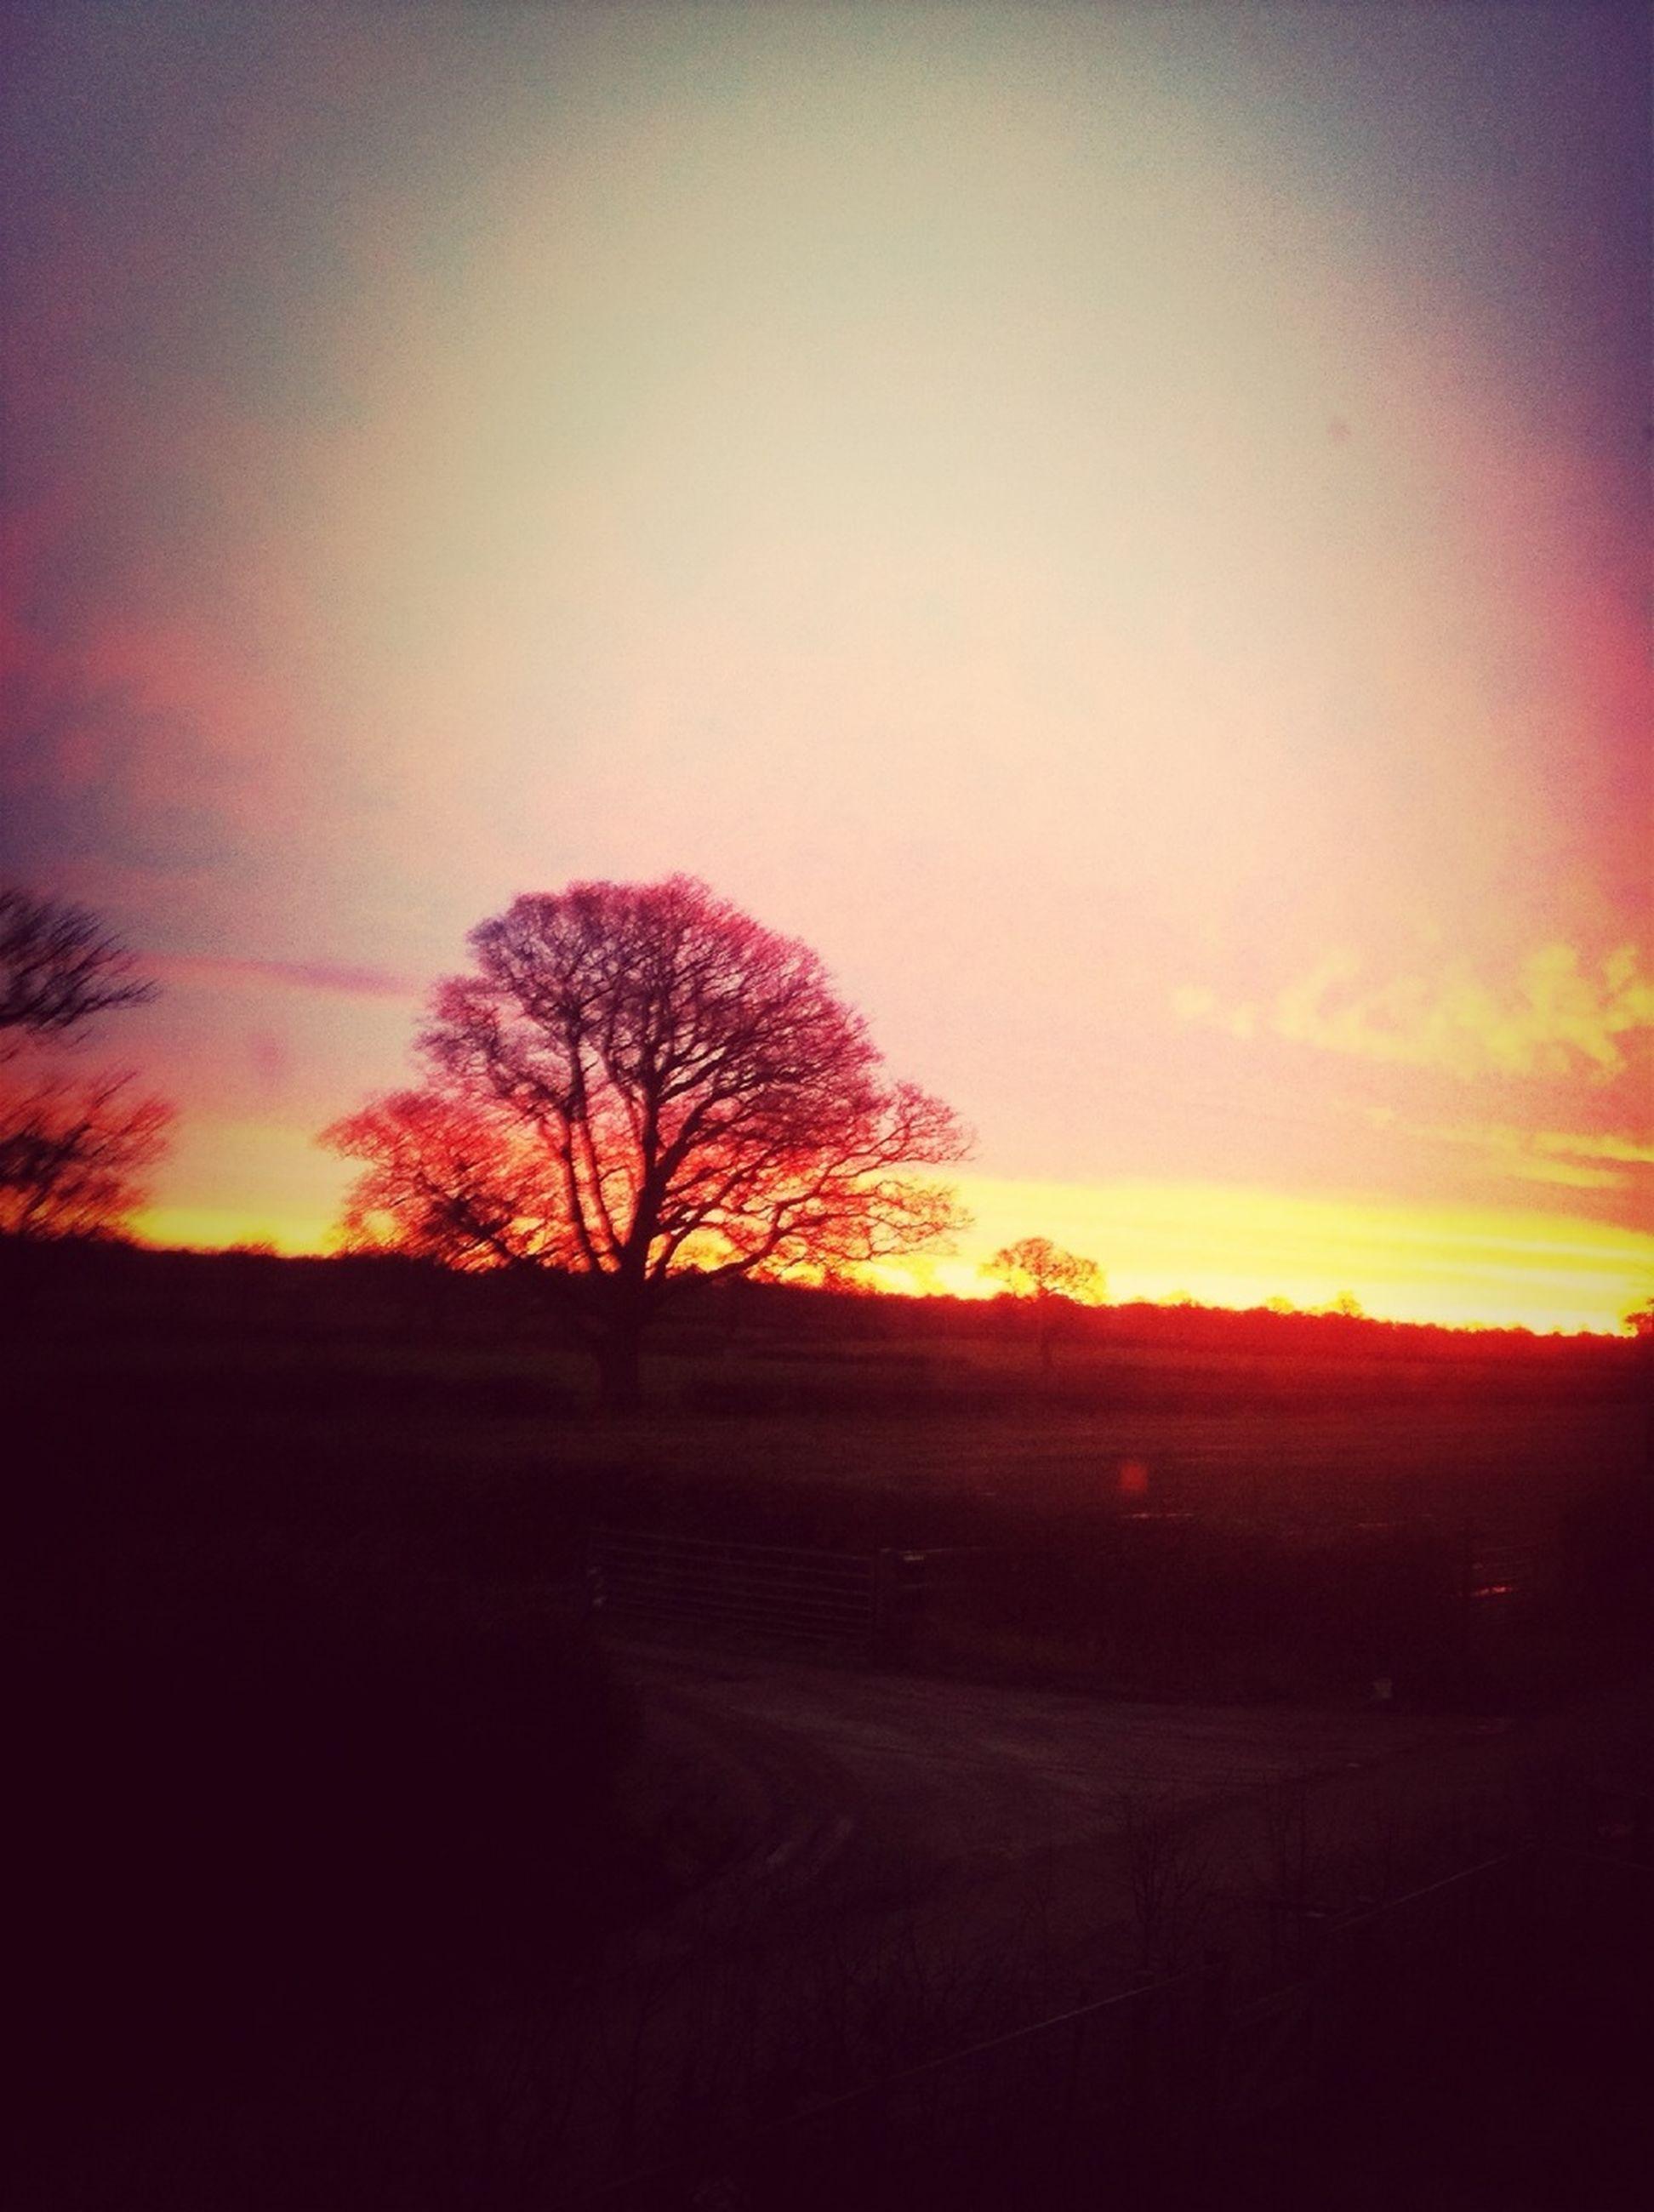 sunset, silhouette, tranquil scene, tranquility, tree, bare tree, scenics, landscape, sky, orange color, beauty in nature, nature, field, idyllic, dark, dusk, outdoors, no people, non-urban scene, remote